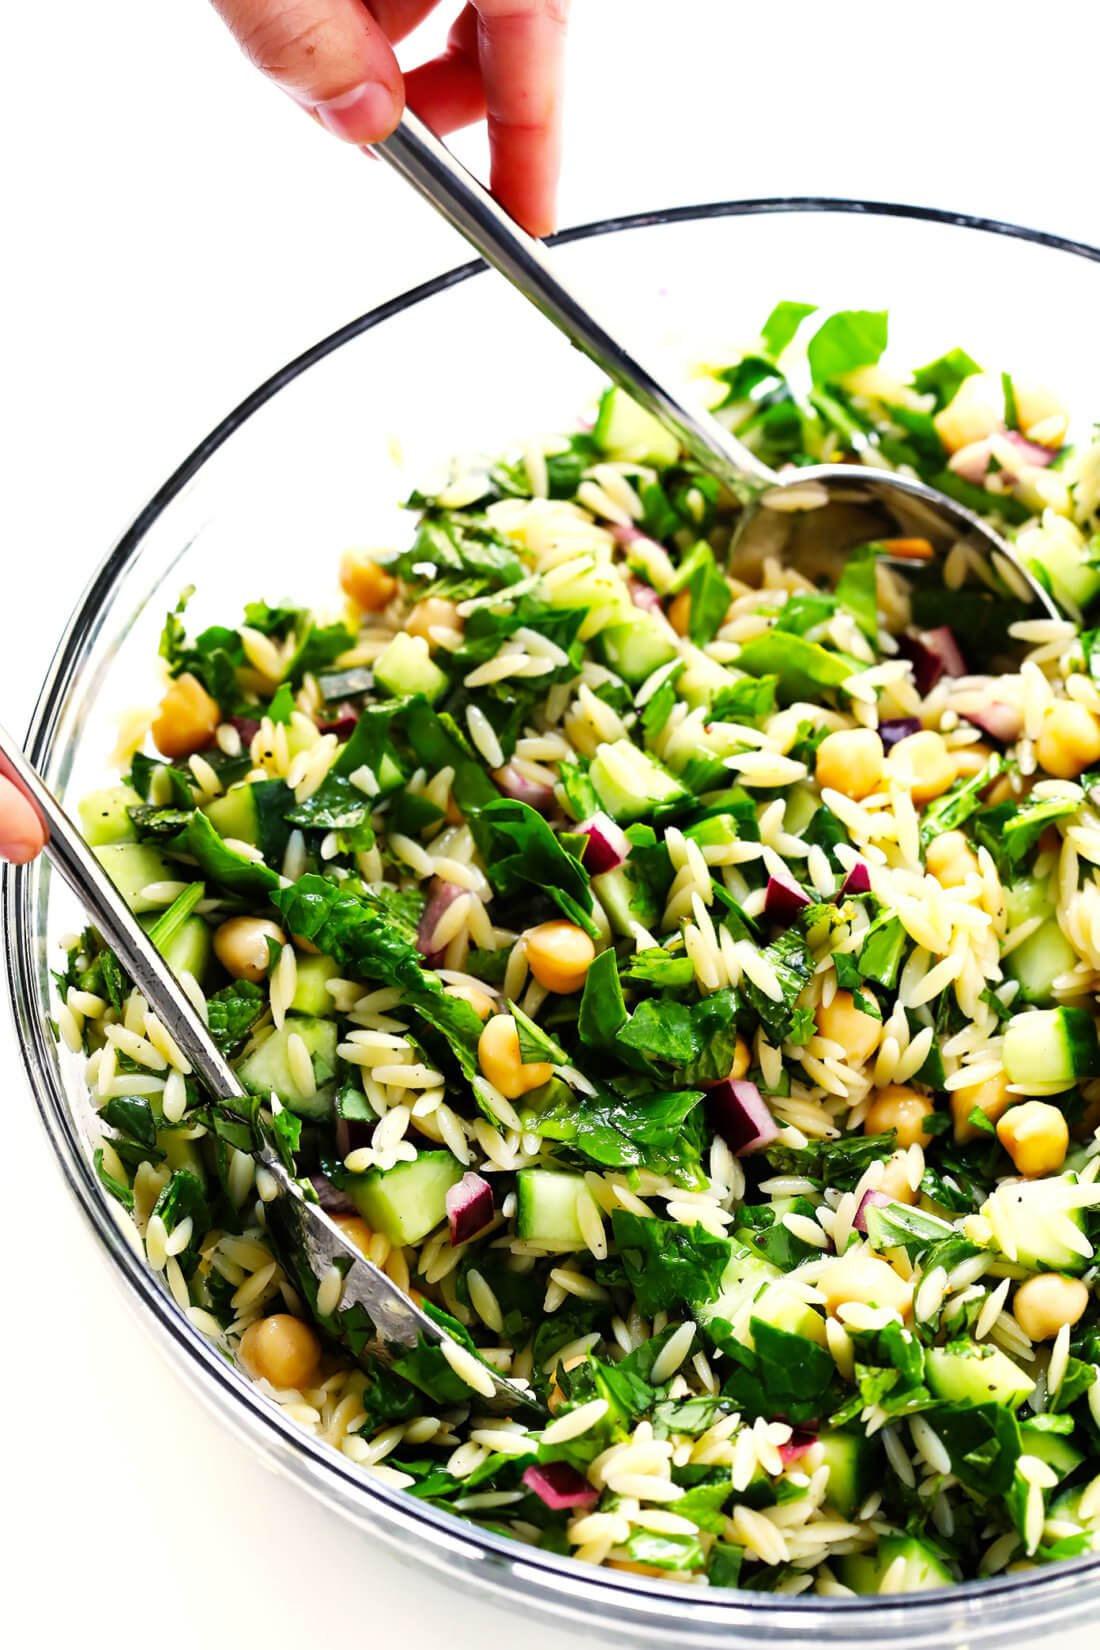 Herb Lovers Lemony Orzo Pasta Salad